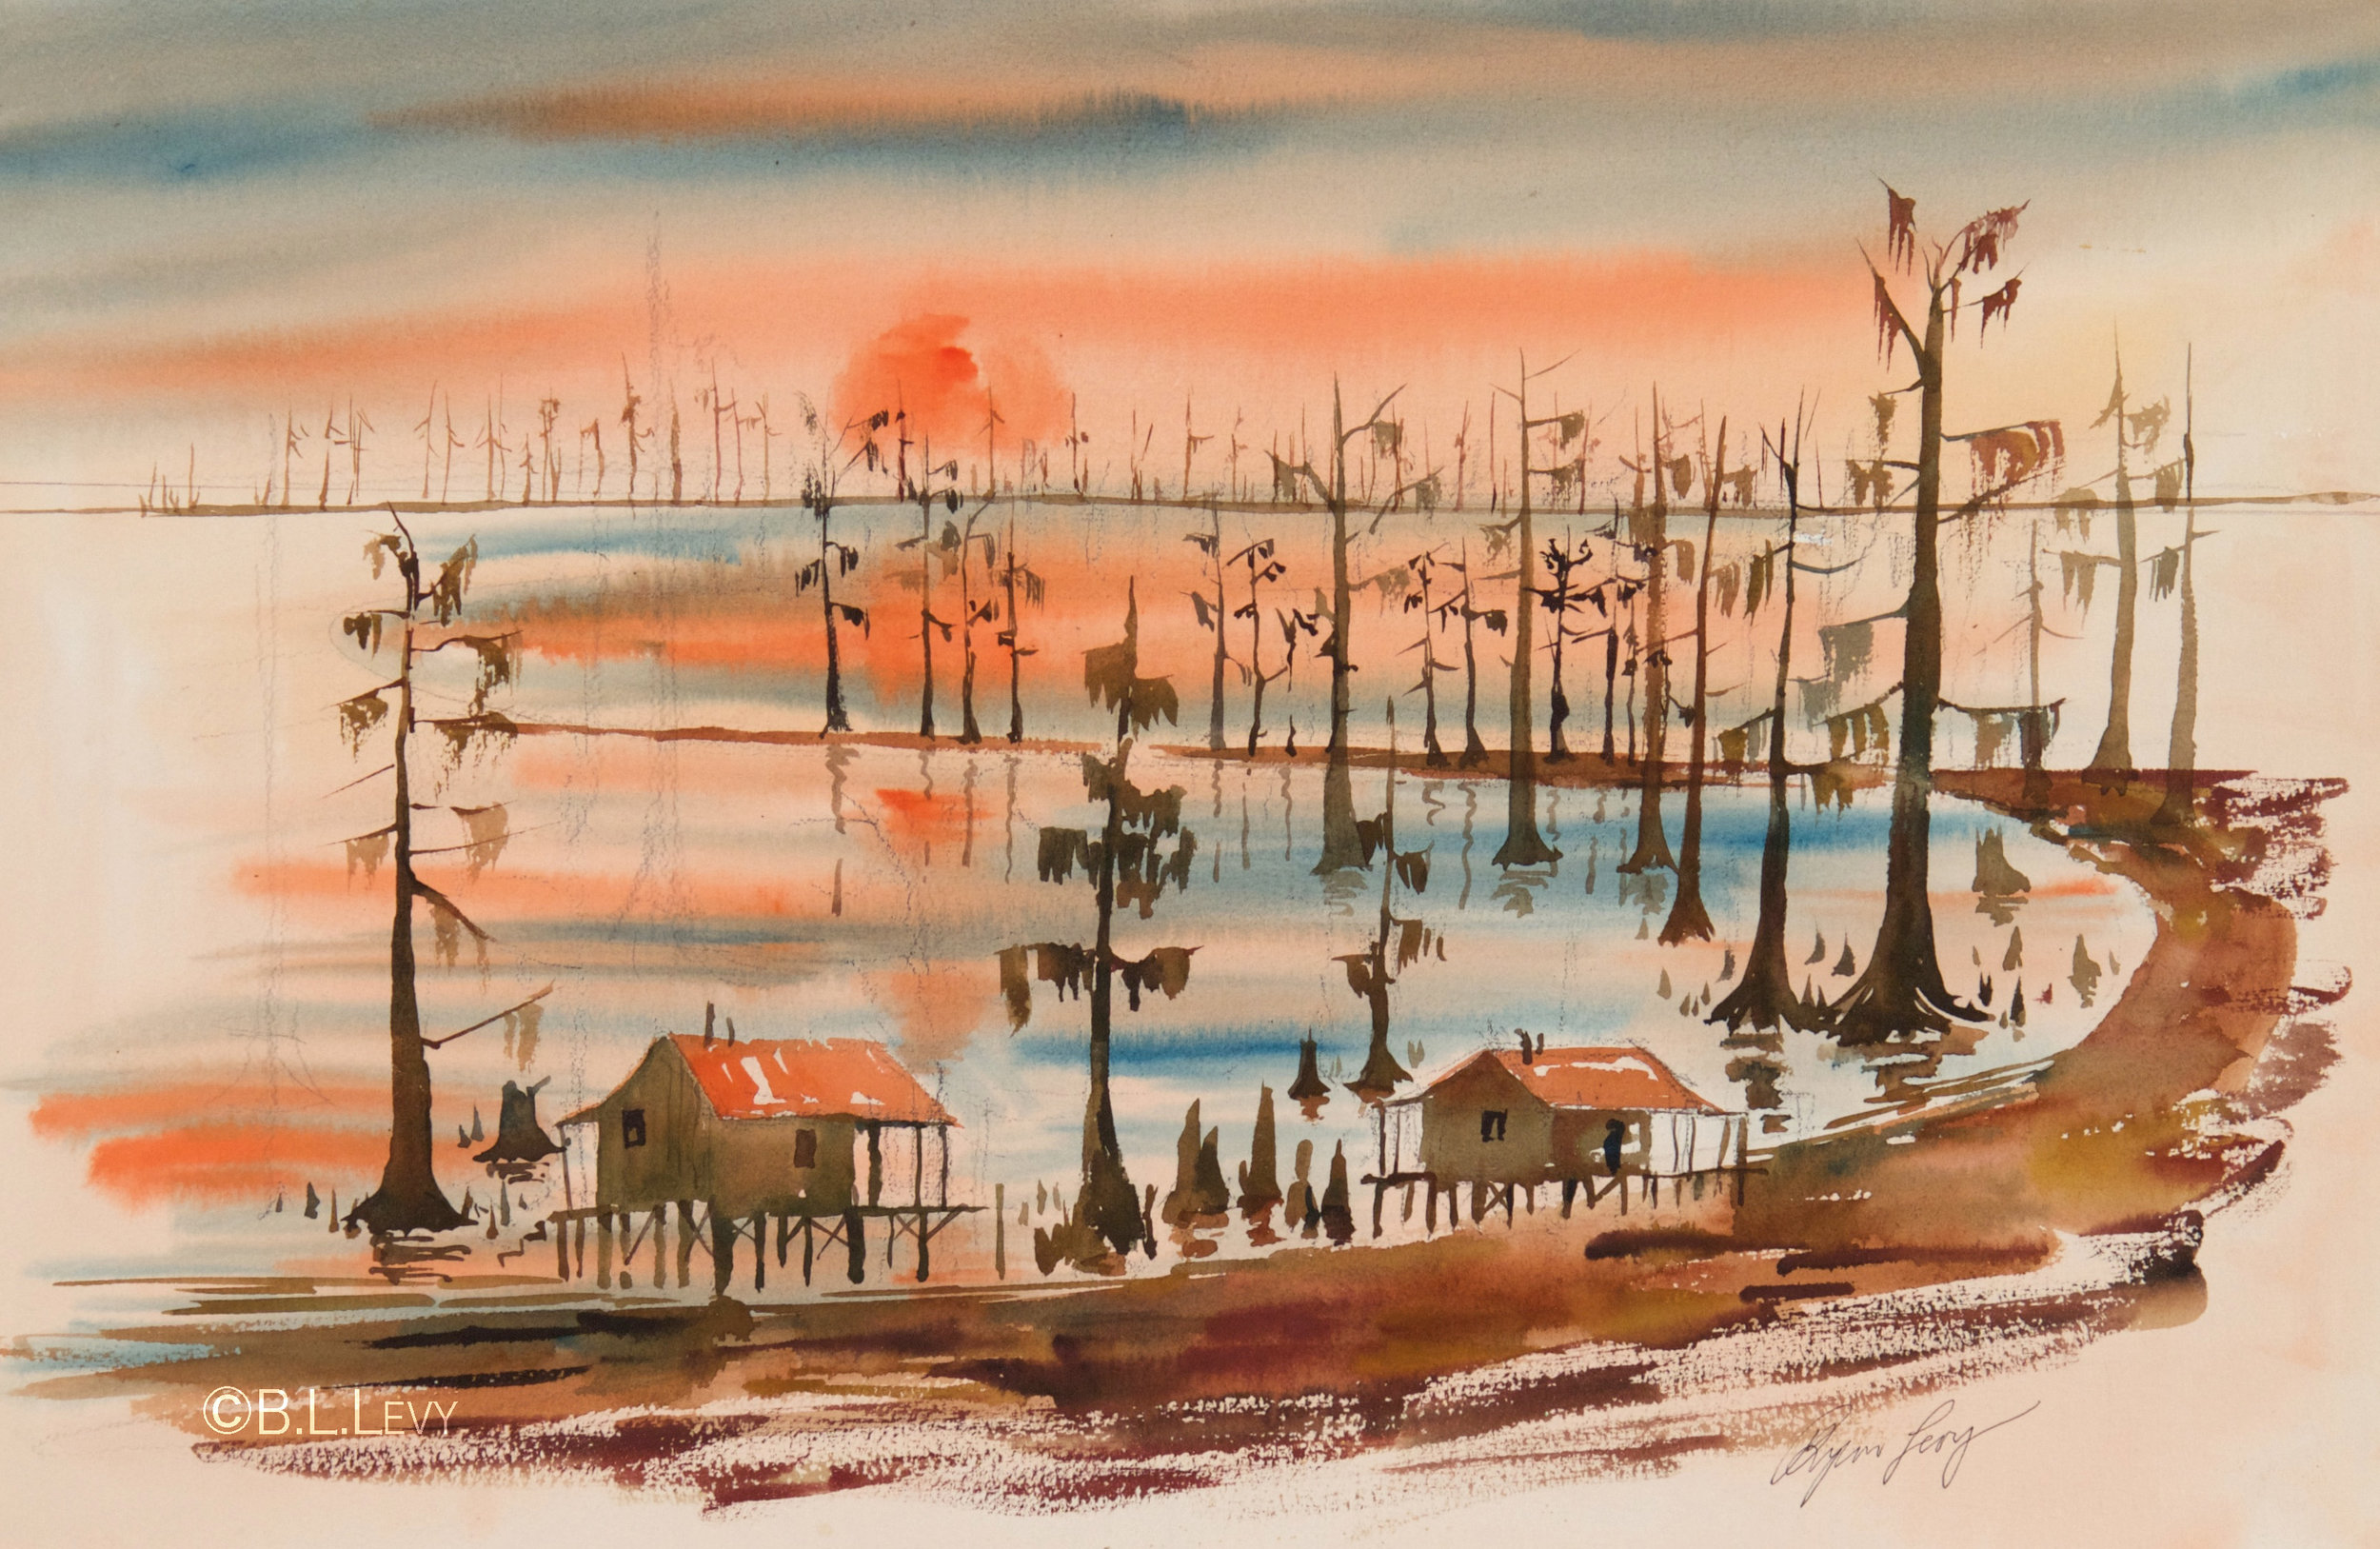 Louisiana-swamp-scene-copy.jpg